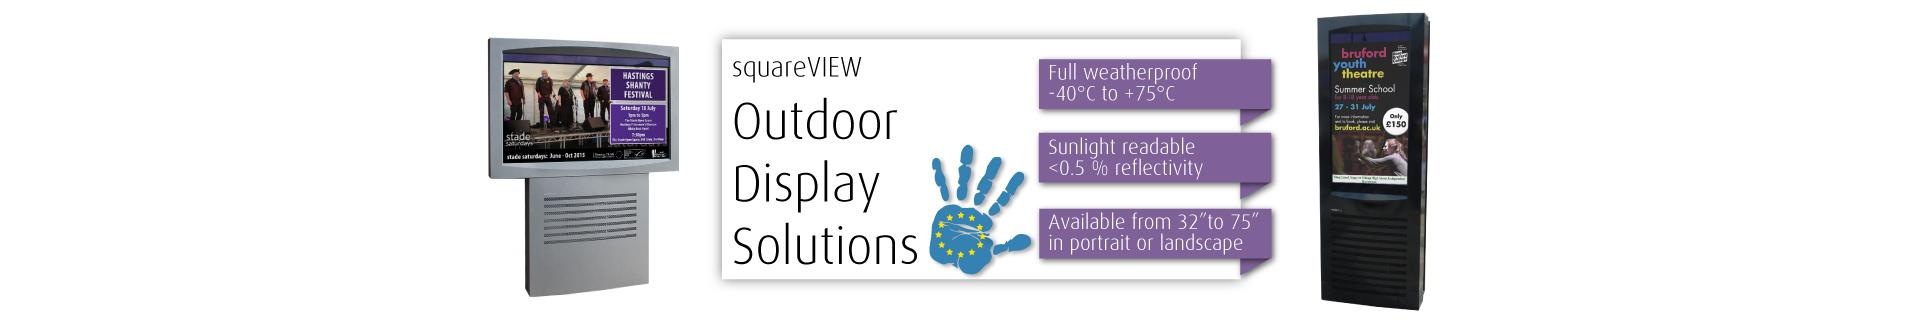 Digital Outdoor Advertising Totem Screens